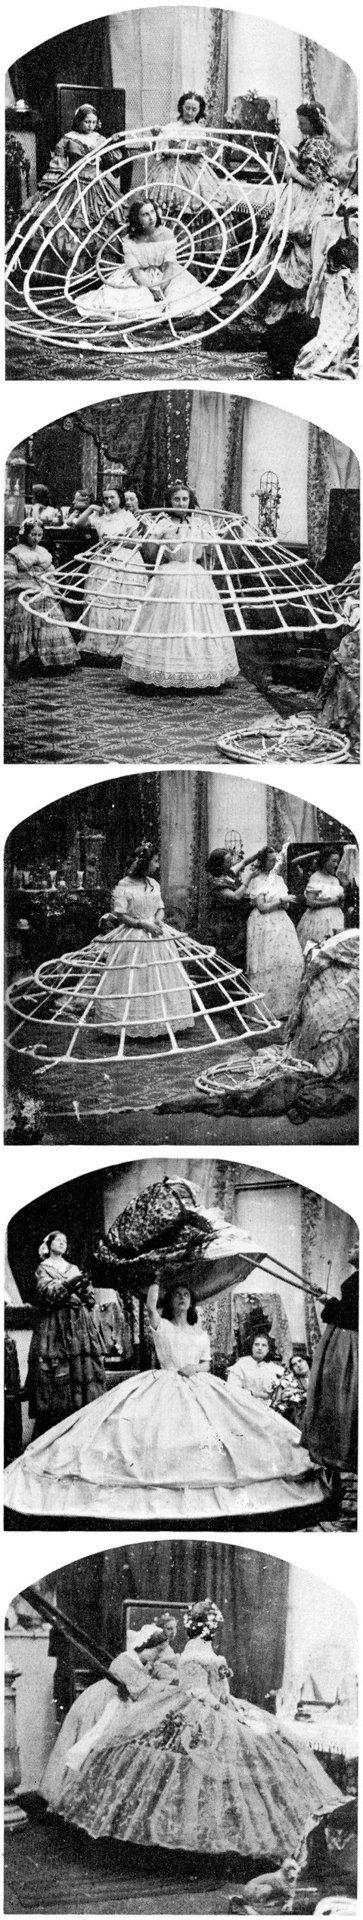 putting on a crinoline, ca. 1860.